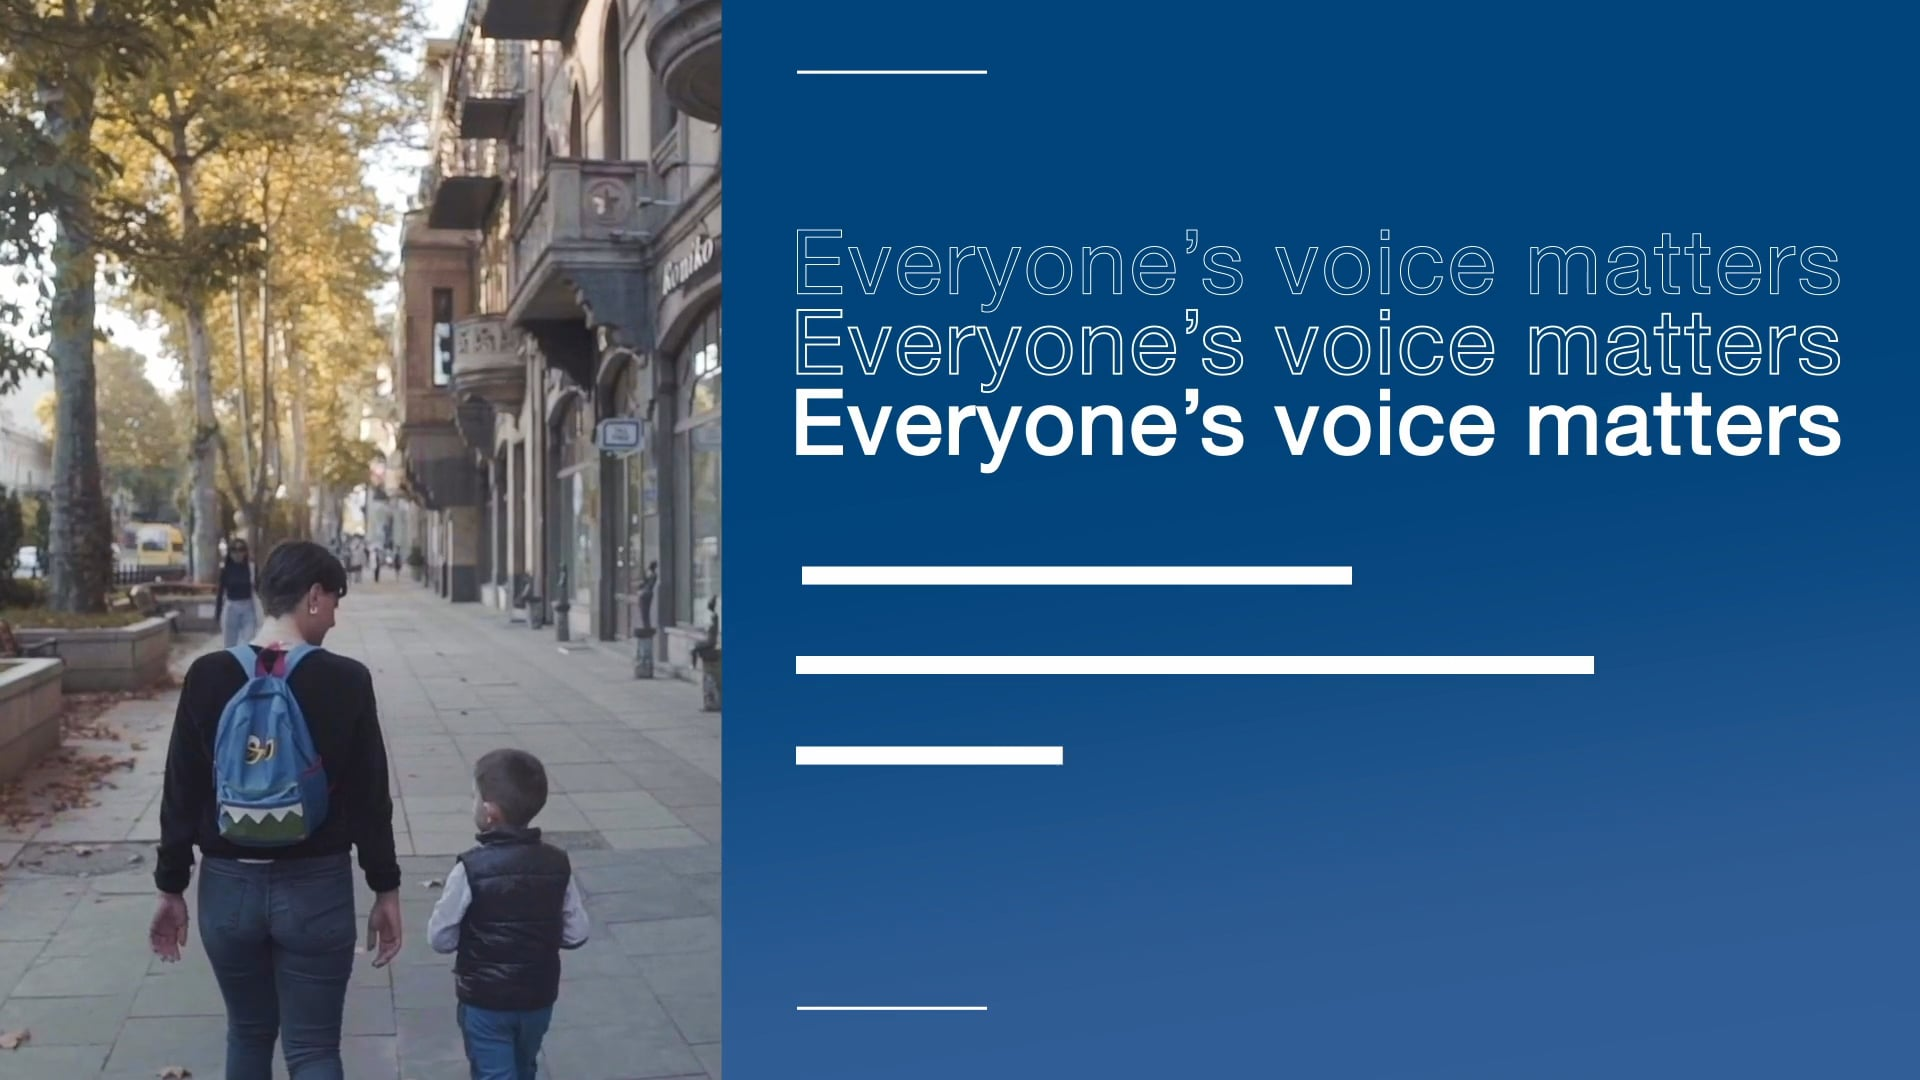 Everyone's voice matters - Georgia | Twitter